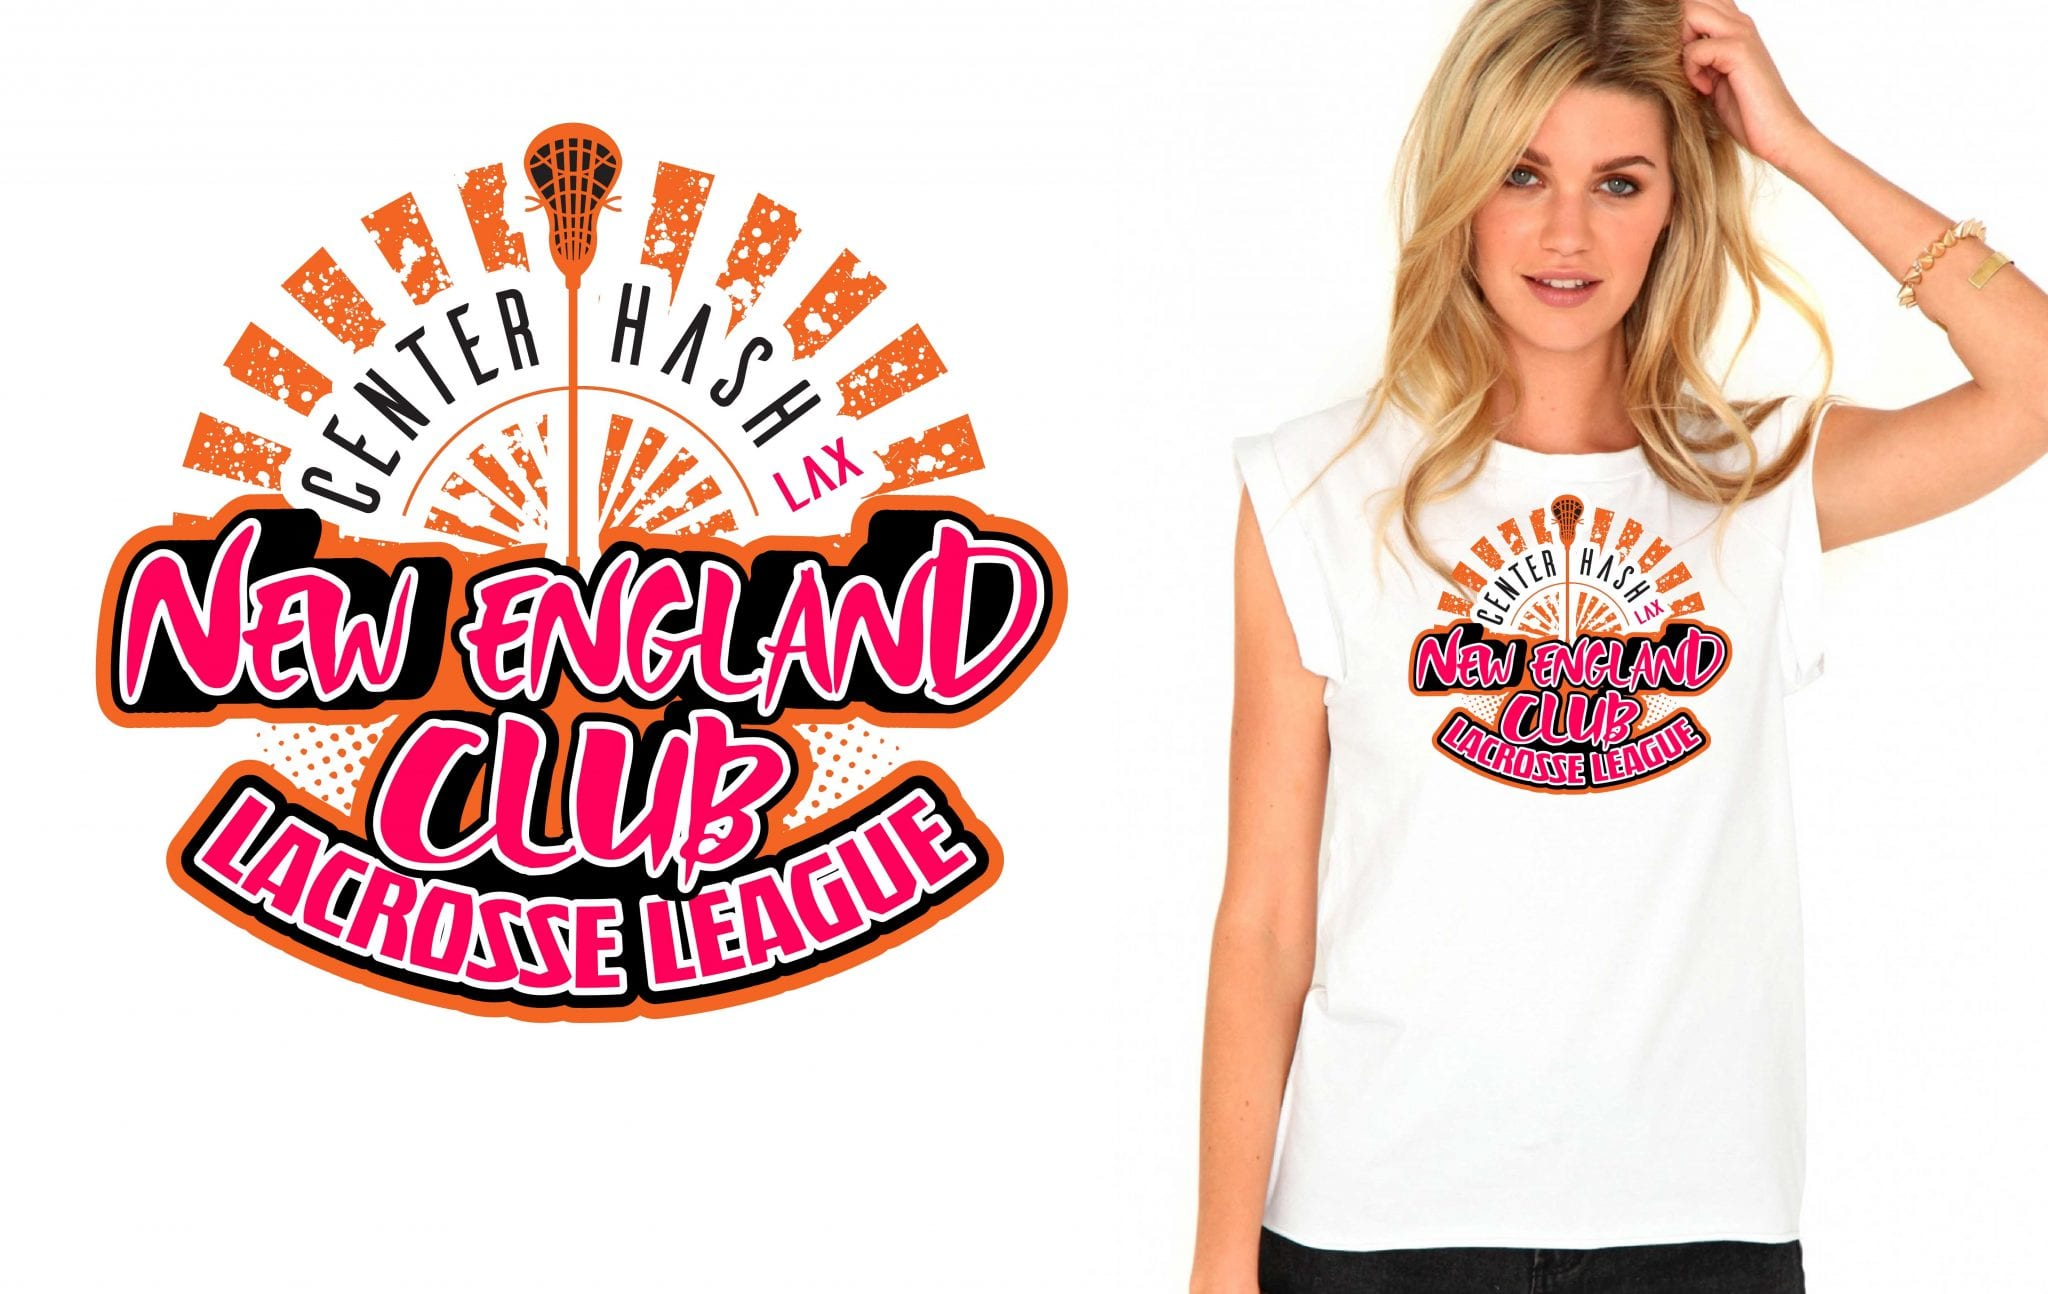 New England Club Lacrosse League awesome tshirt design 2